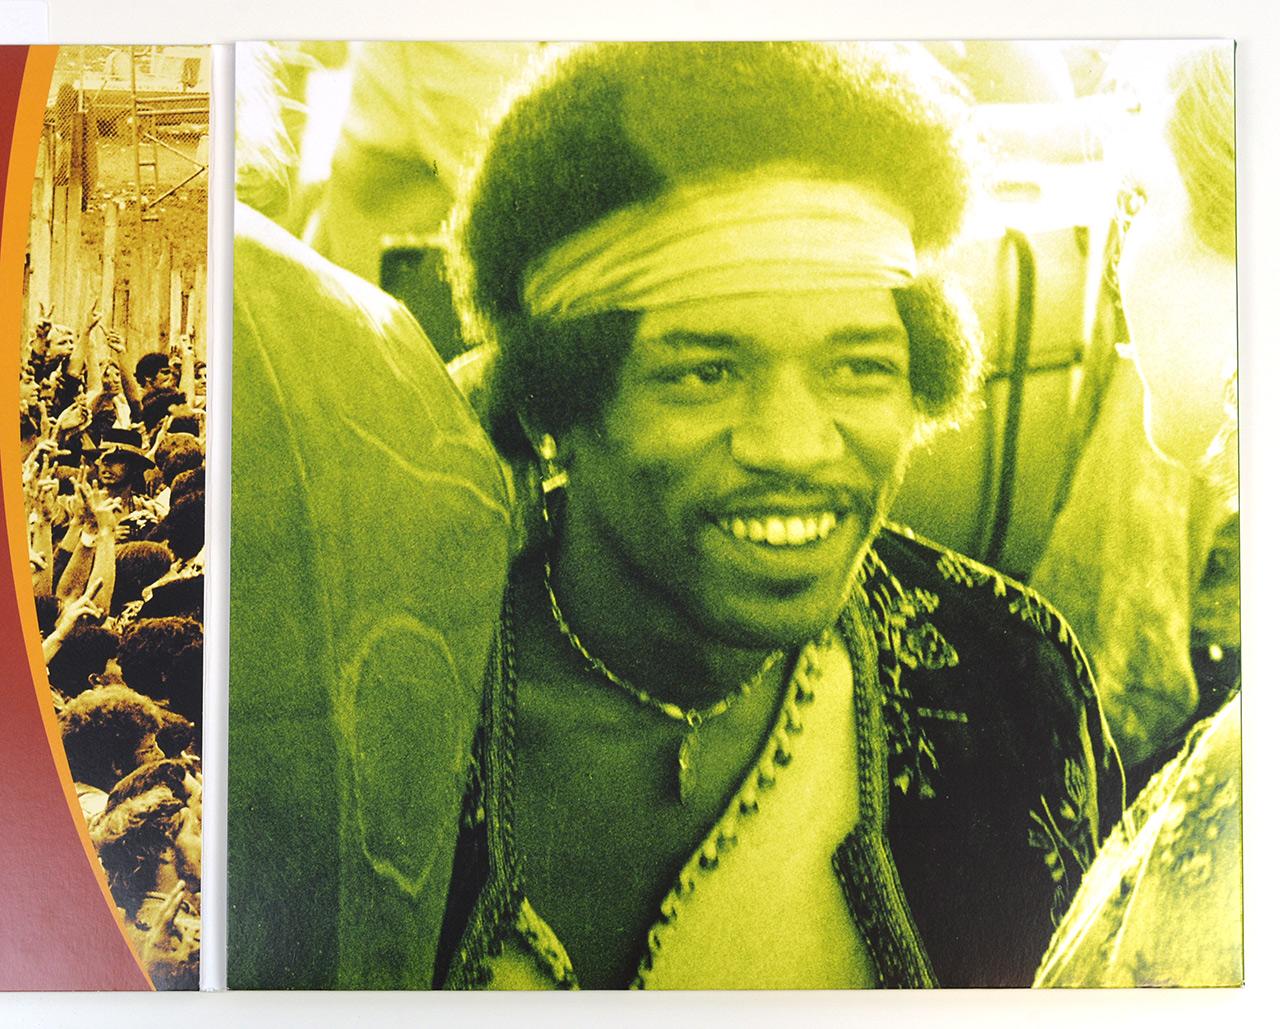 A0645 JIMI HENDRIX Live at Woodstock 3LP